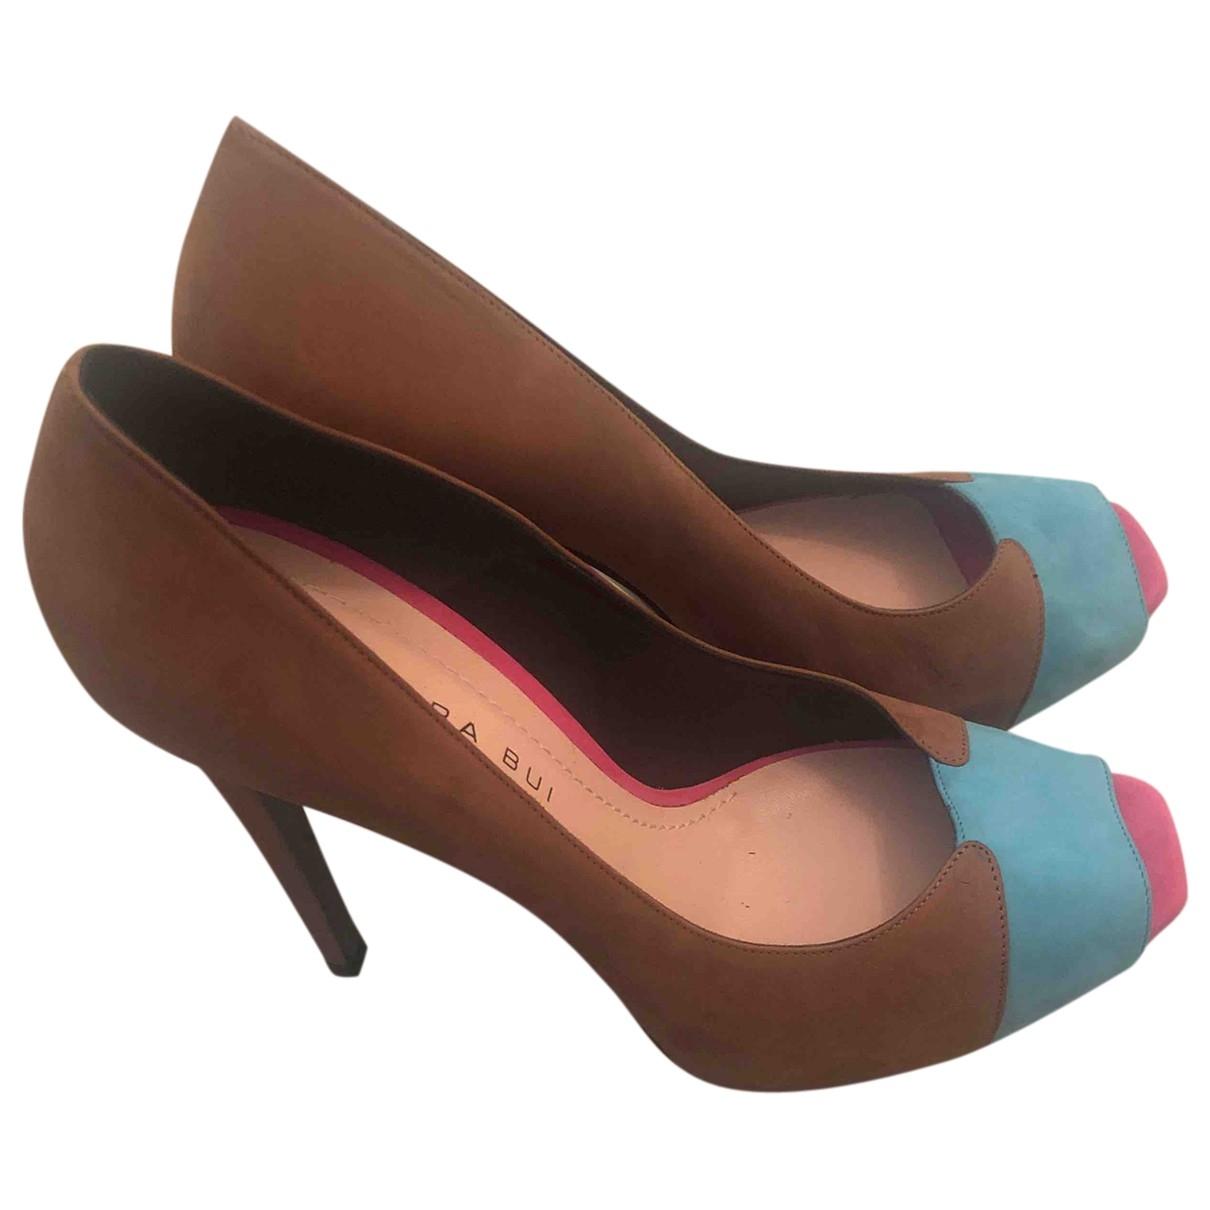 Barbara Bui \N Brown Leather Heels for Women 37.5 EU